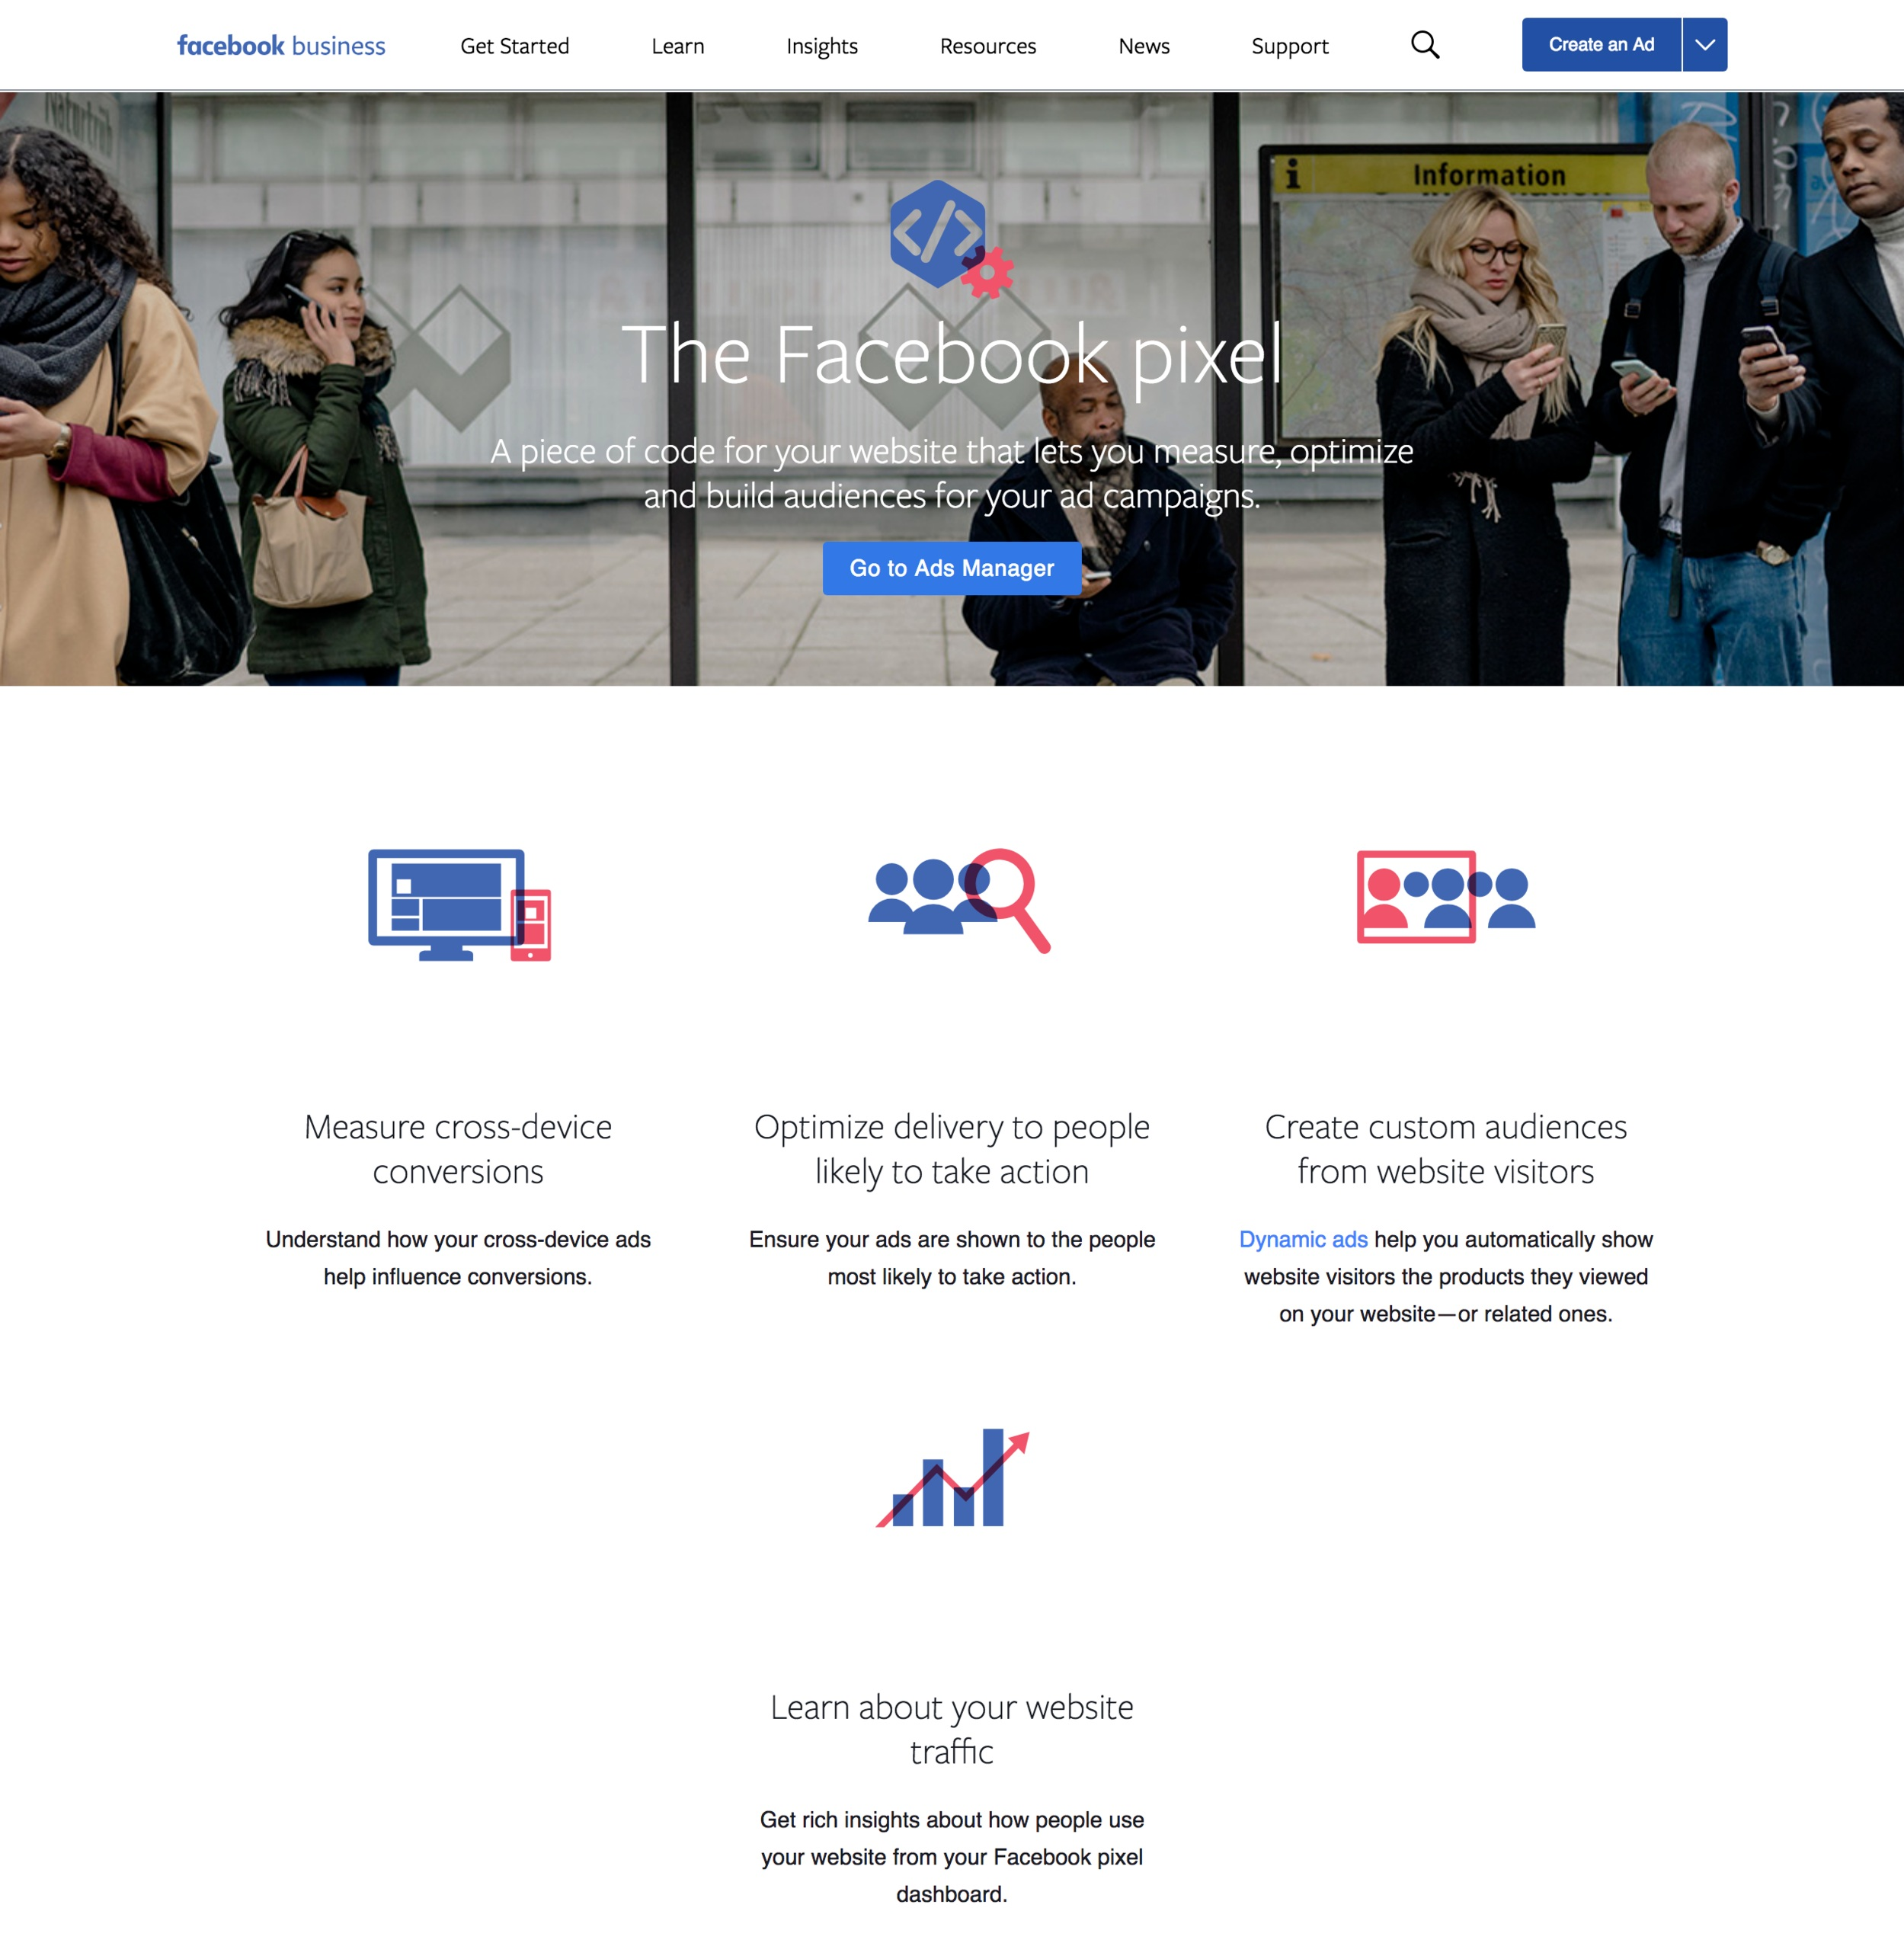 facebook-business-learn-facebook-ads-pixel.jpg